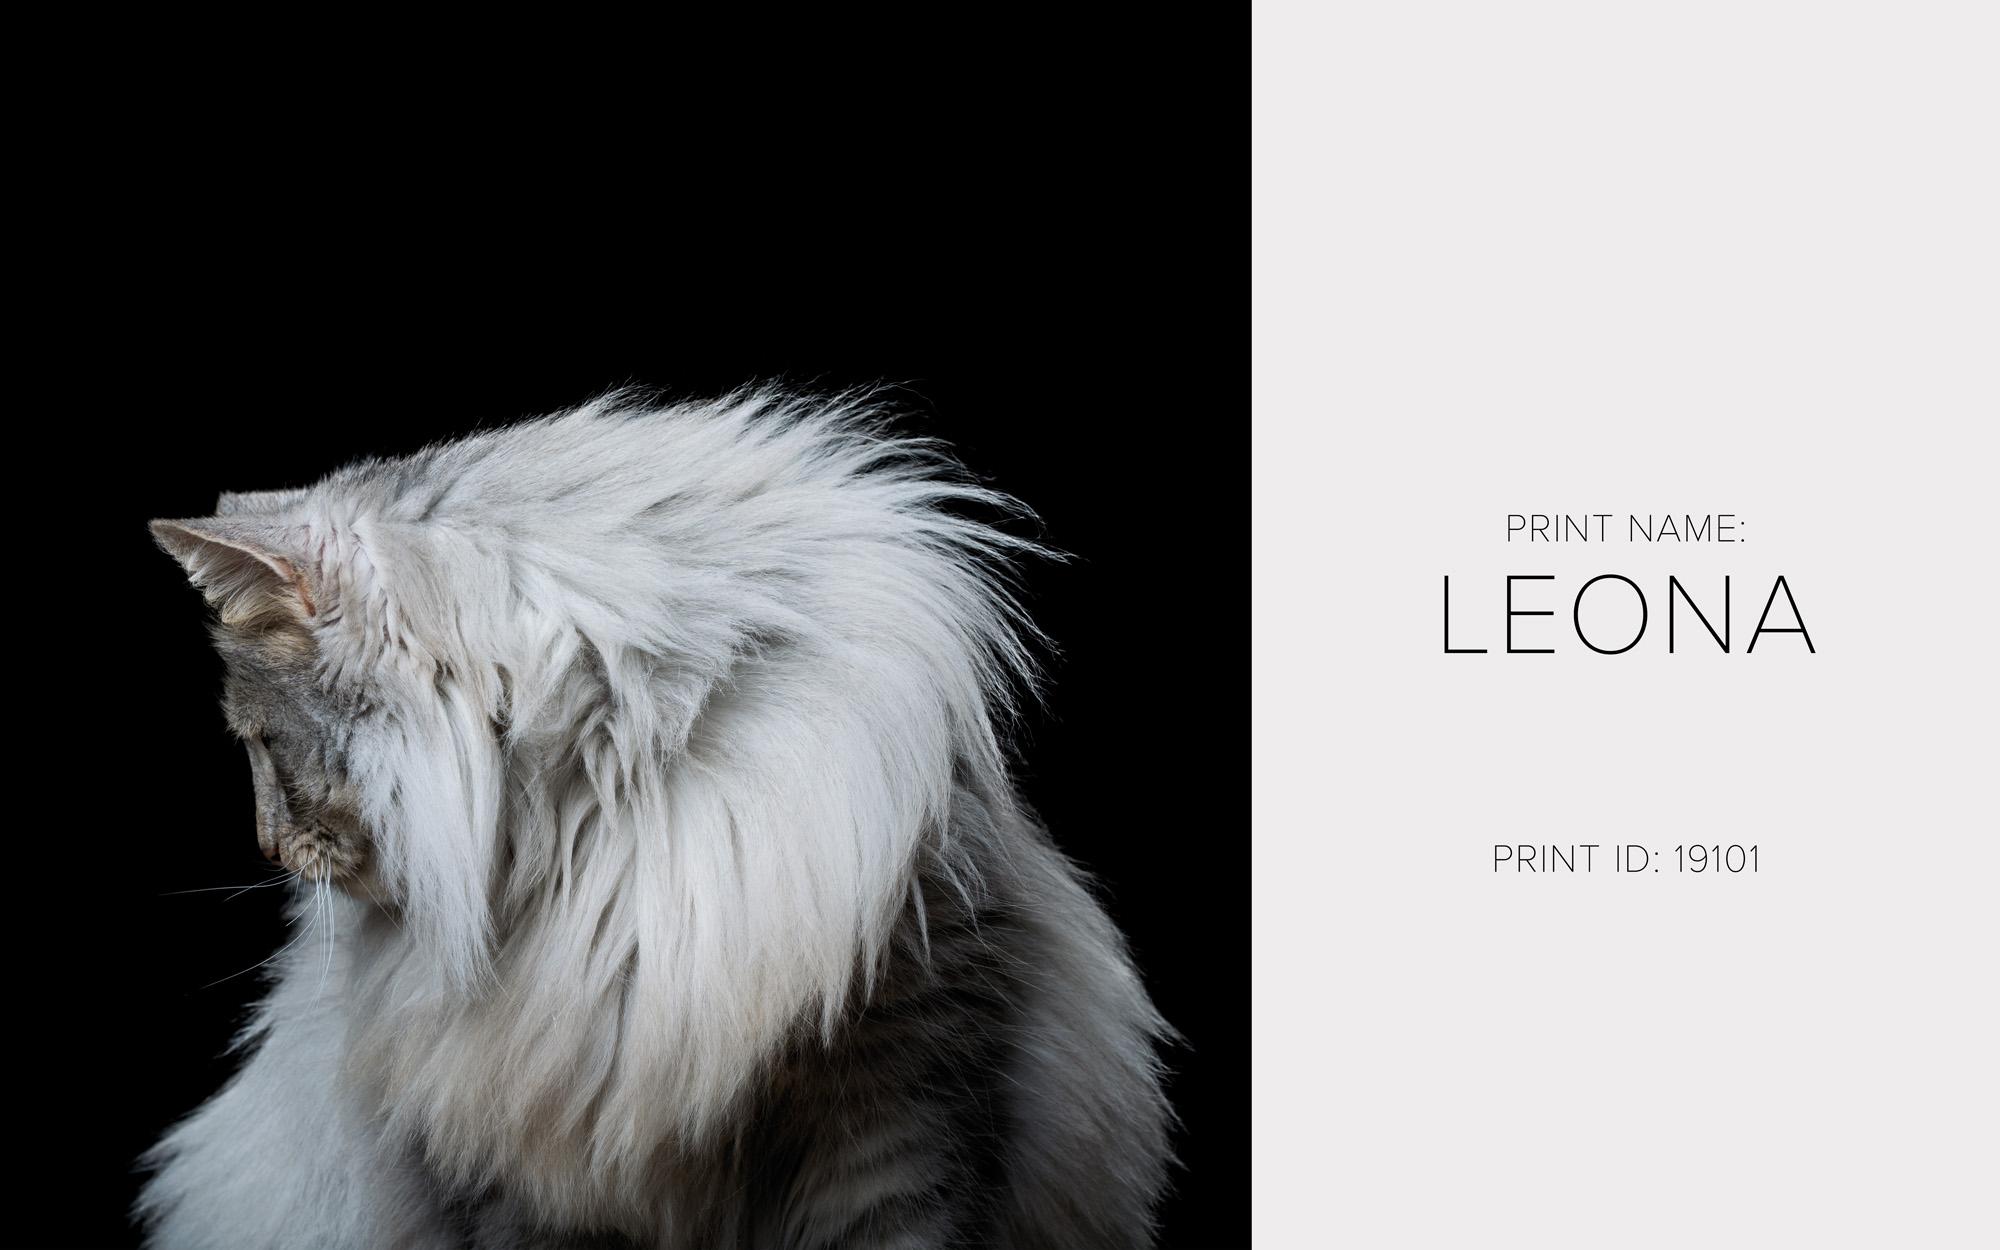 Leona_Print.jpg